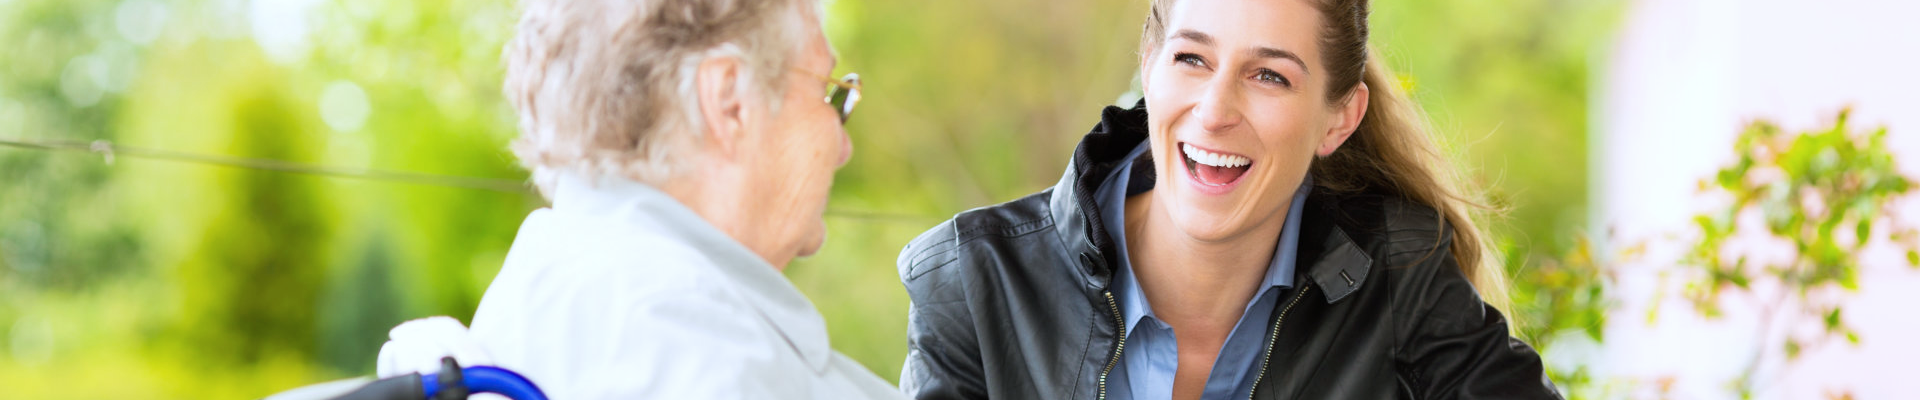 caregiver smiling to patient